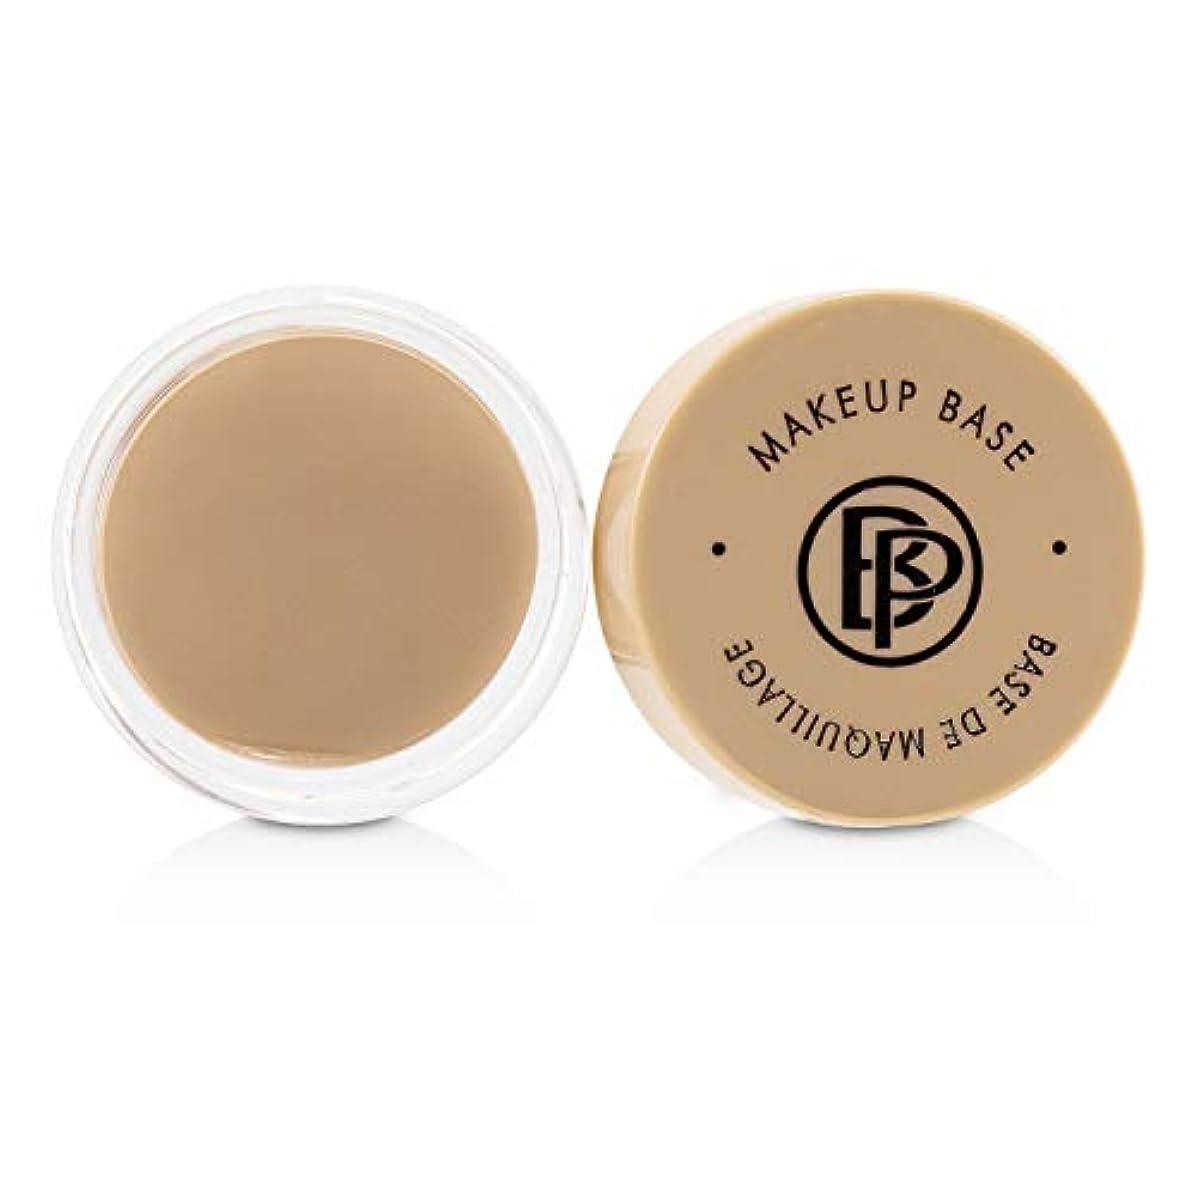 区火山誘惑Bellapierre Cosmetics Makeup Base 5g/0.176oz並行輸入品